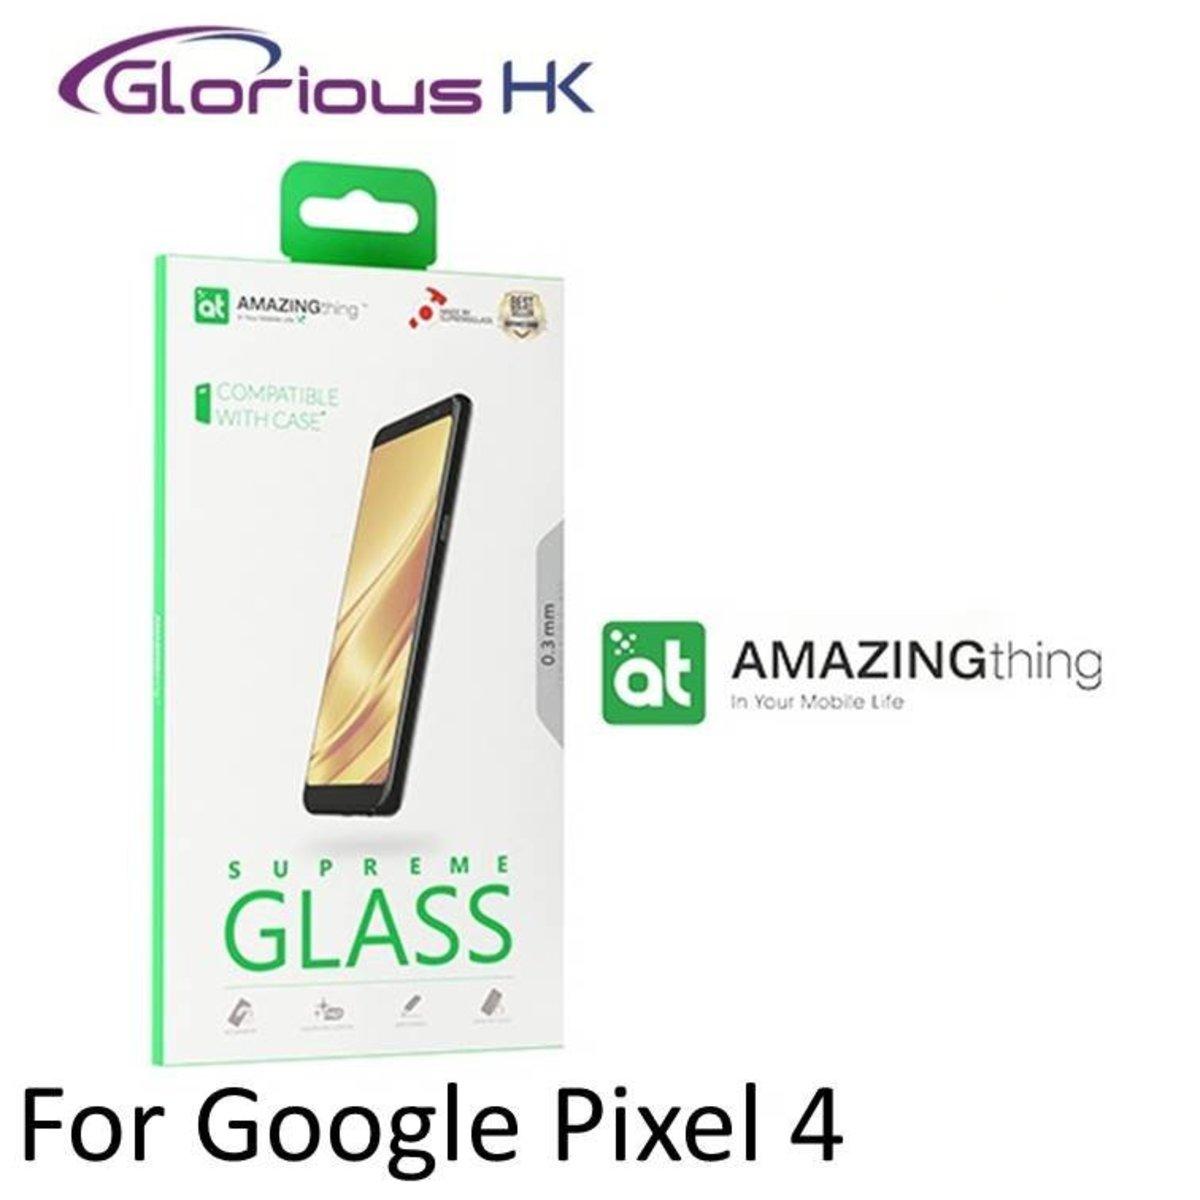 Google Pixel 4 SupremeGlass Full Cover Screen Protector